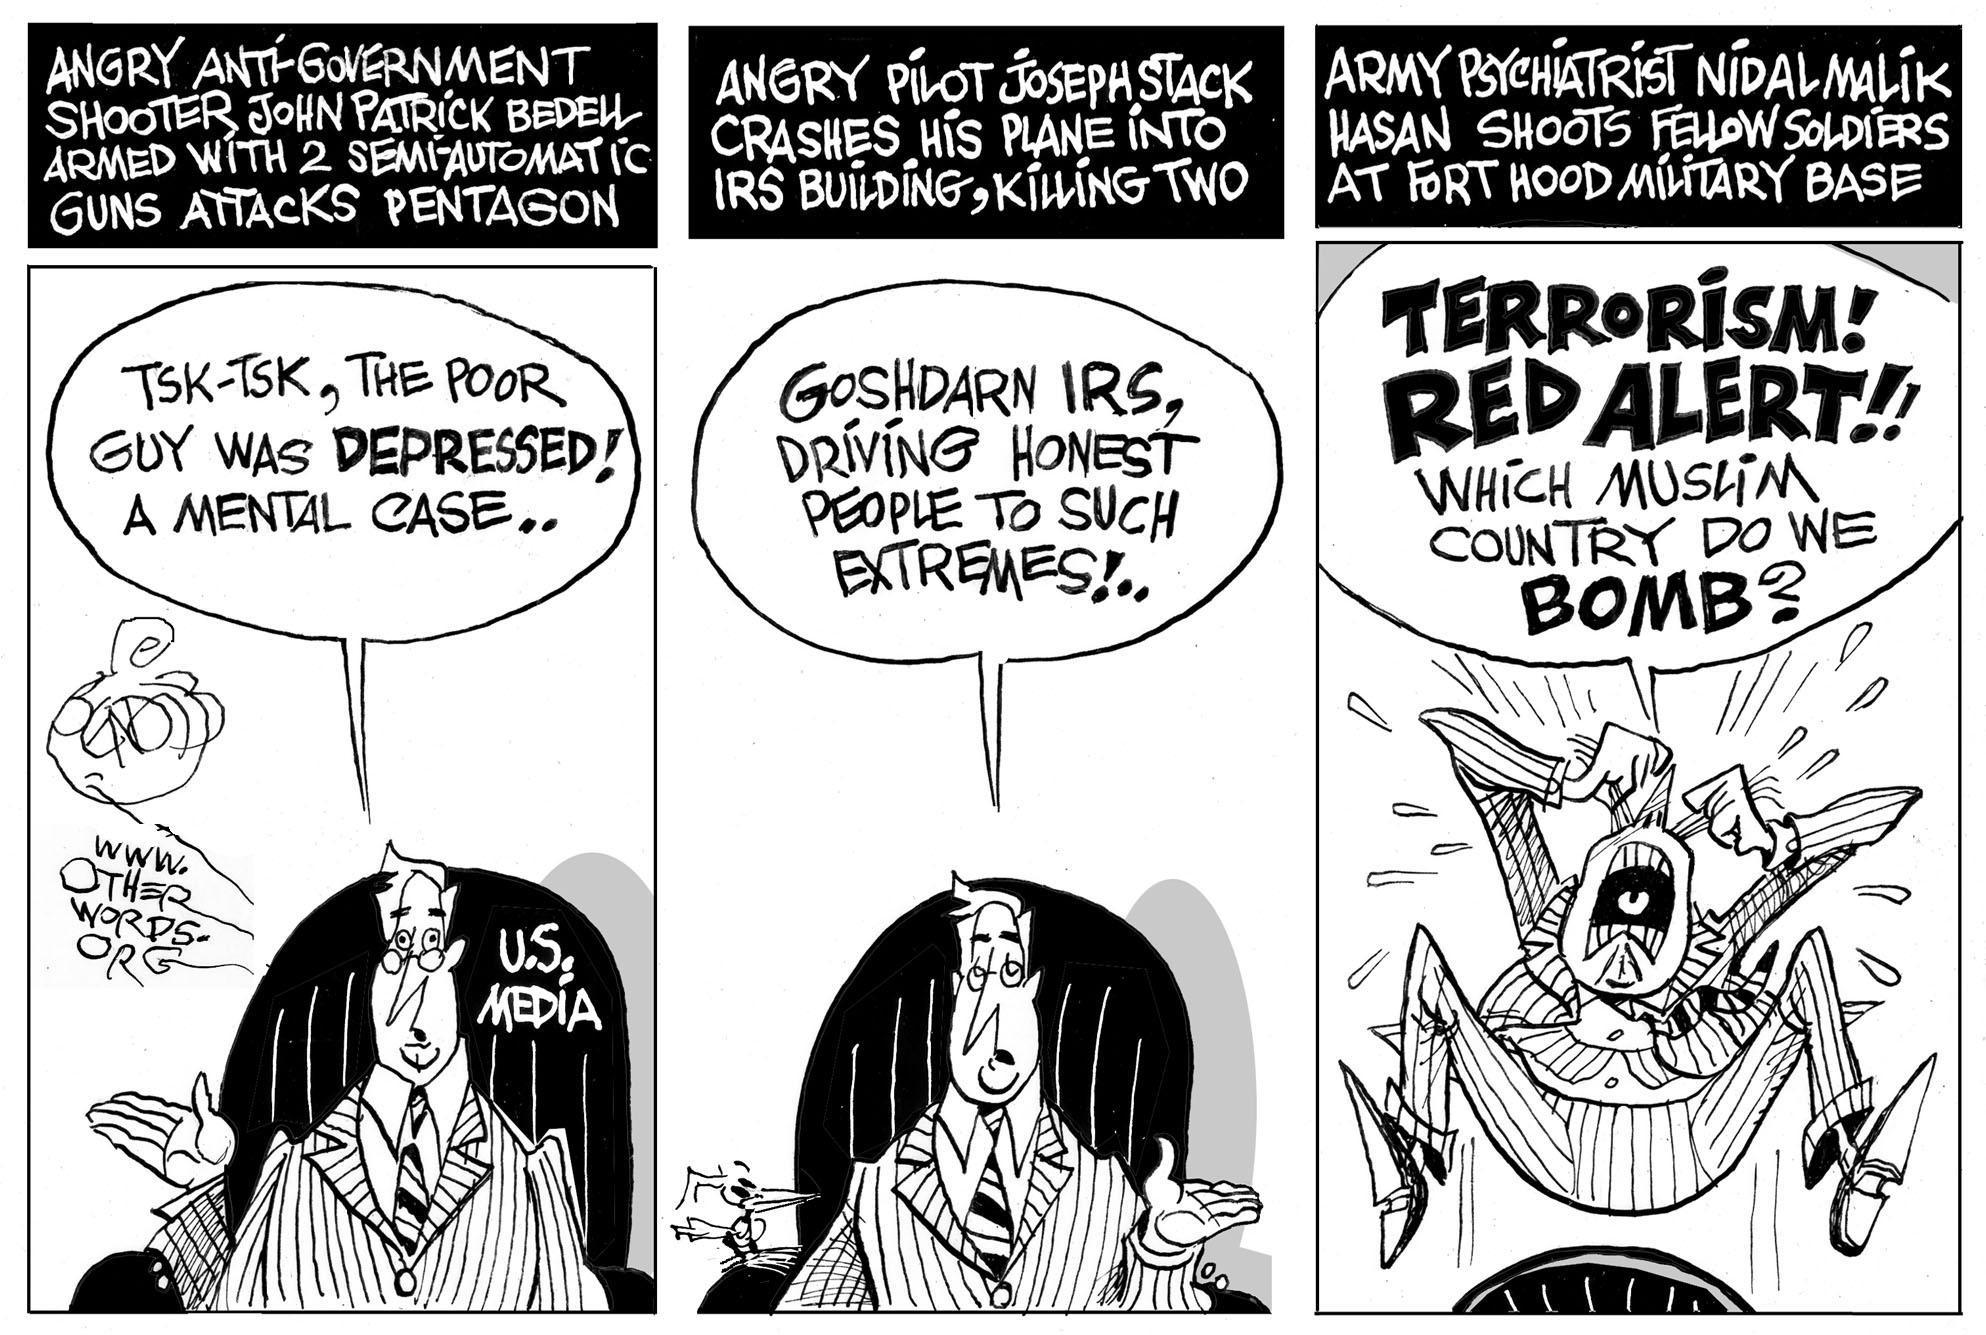 Terrorism in the Eye of the Beholder